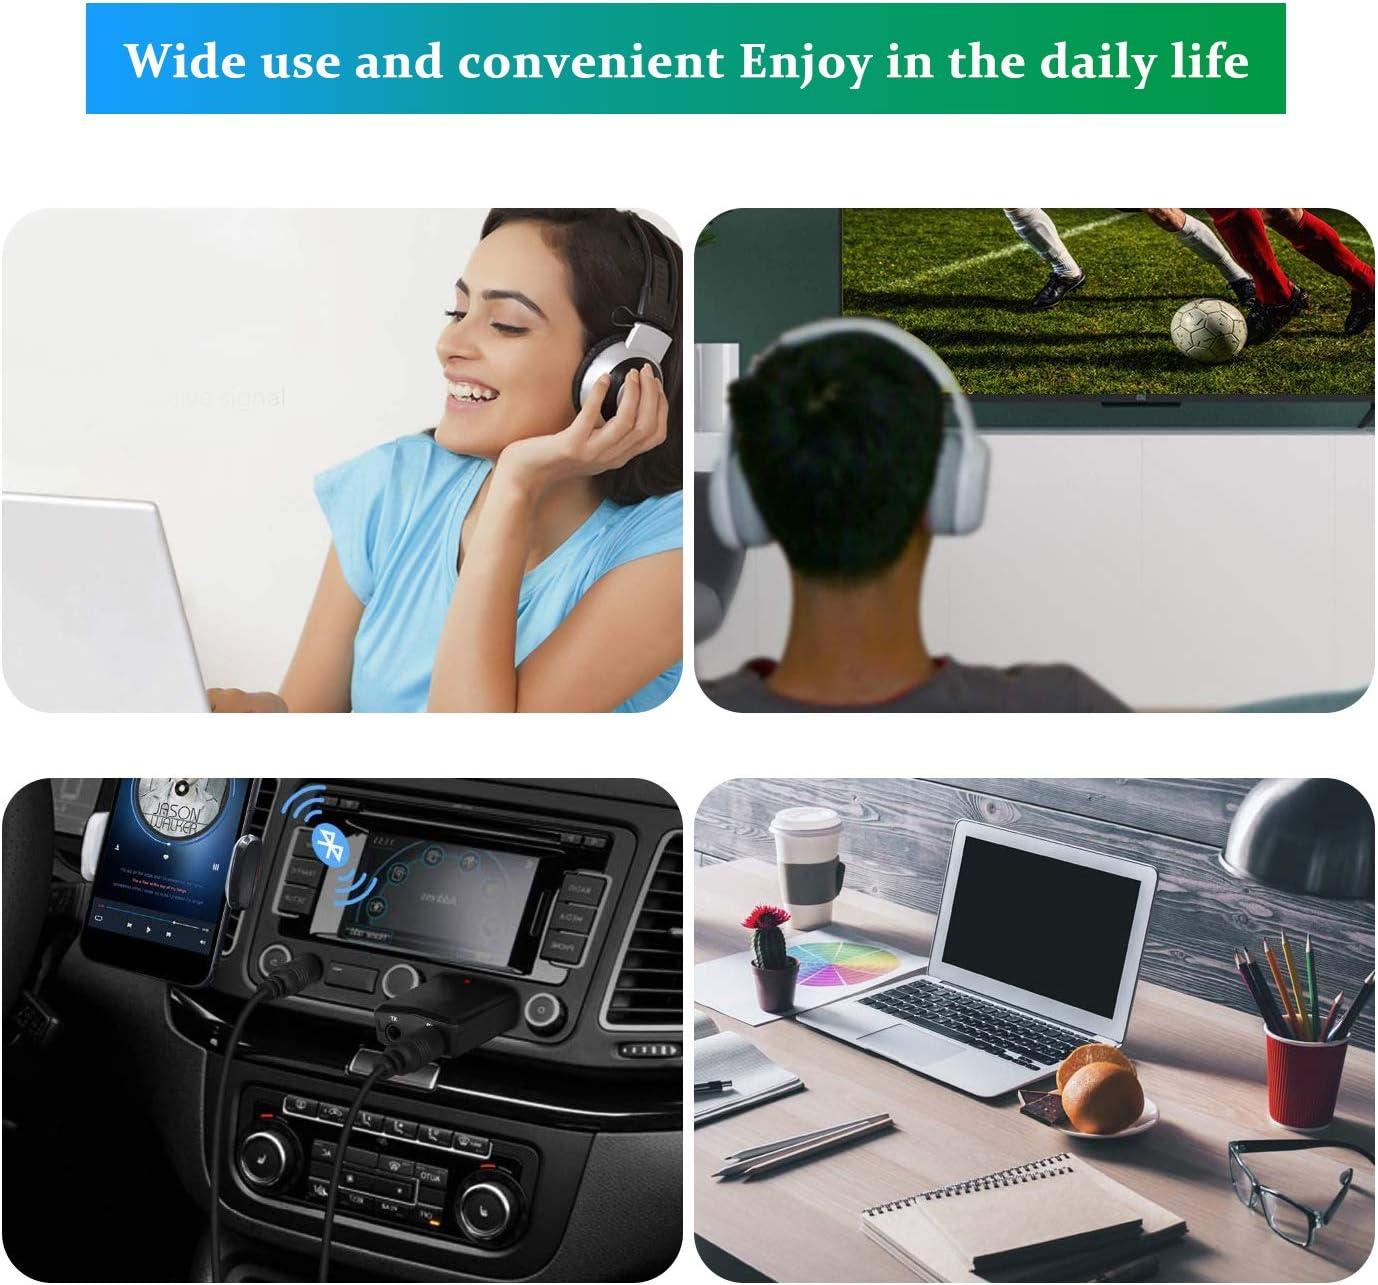 Tokenhigh Adattatore USB Bluetooth 5.0 2 in 1 Bluetooth Trasmettitore Ricevitore Adattatore con 3.5mm AUX Wireless Bluetooth Adattatore Audio per TV//PC//Telefoni//Altoparlanti//Autoradio